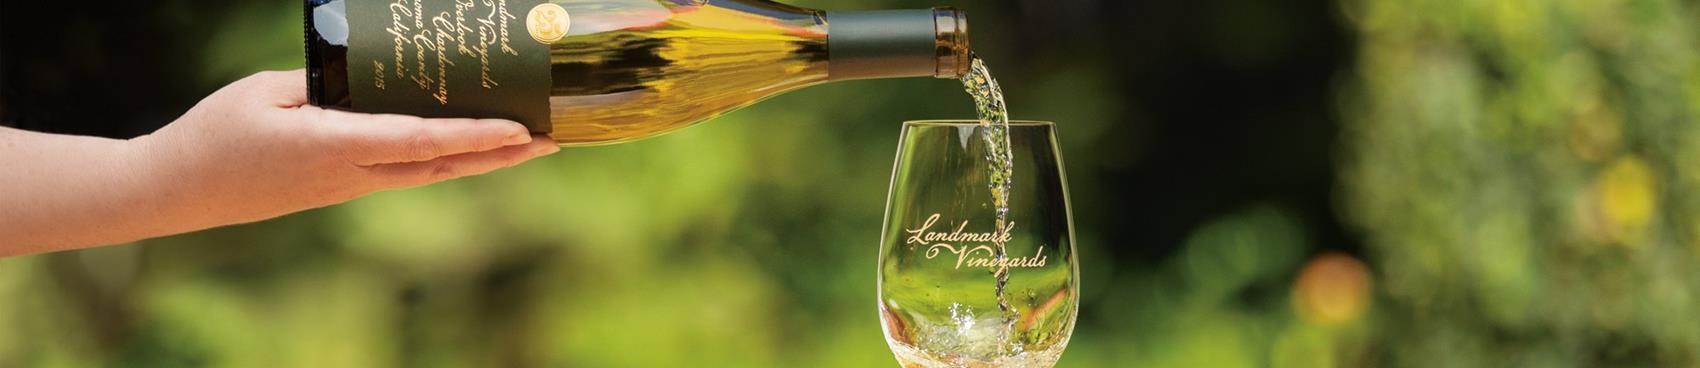 Landmark Vineyards Educational Seminar with the Winemaker